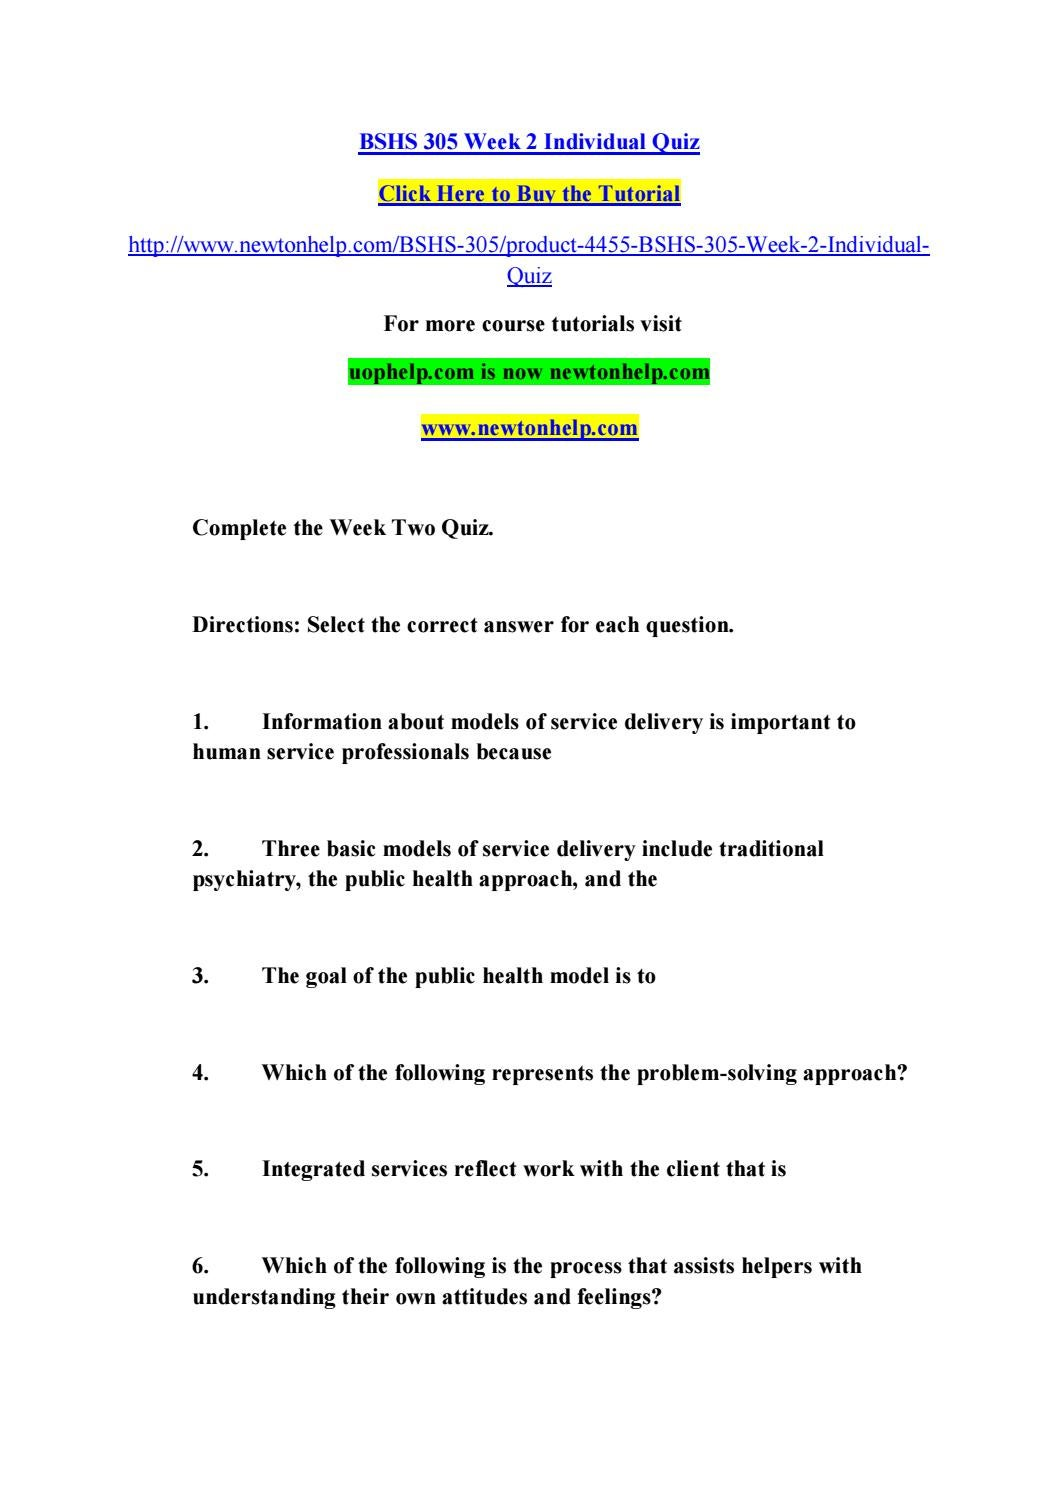 Bshs 305 week 2 individual quiz by sajchfasd hhdjasdbnk321